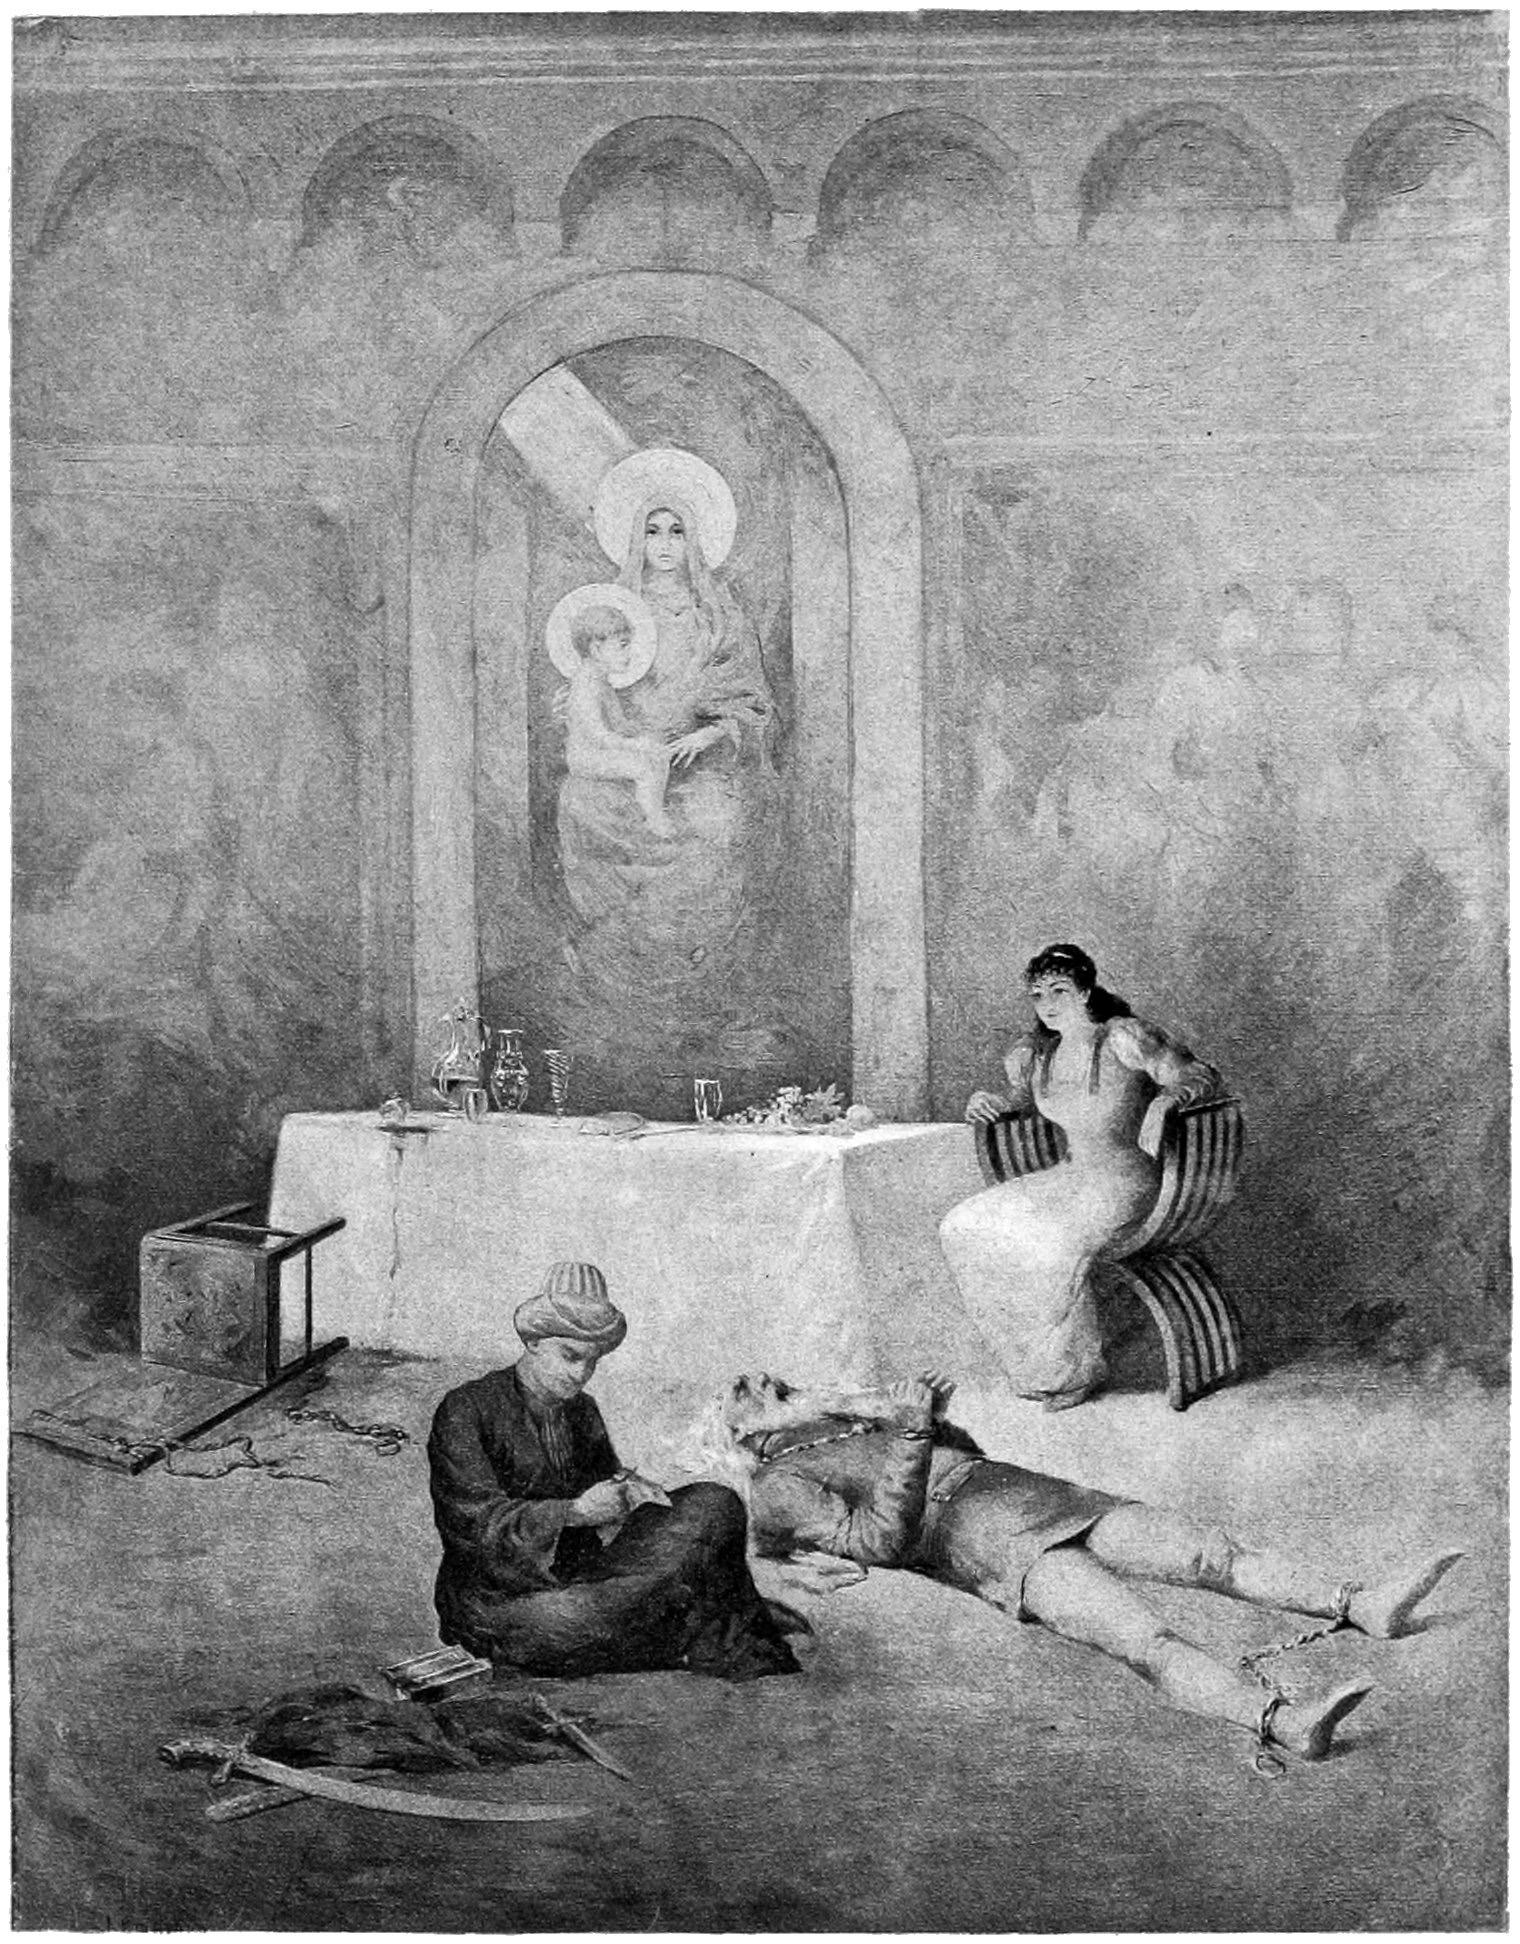 Illustration by Albert Letchford